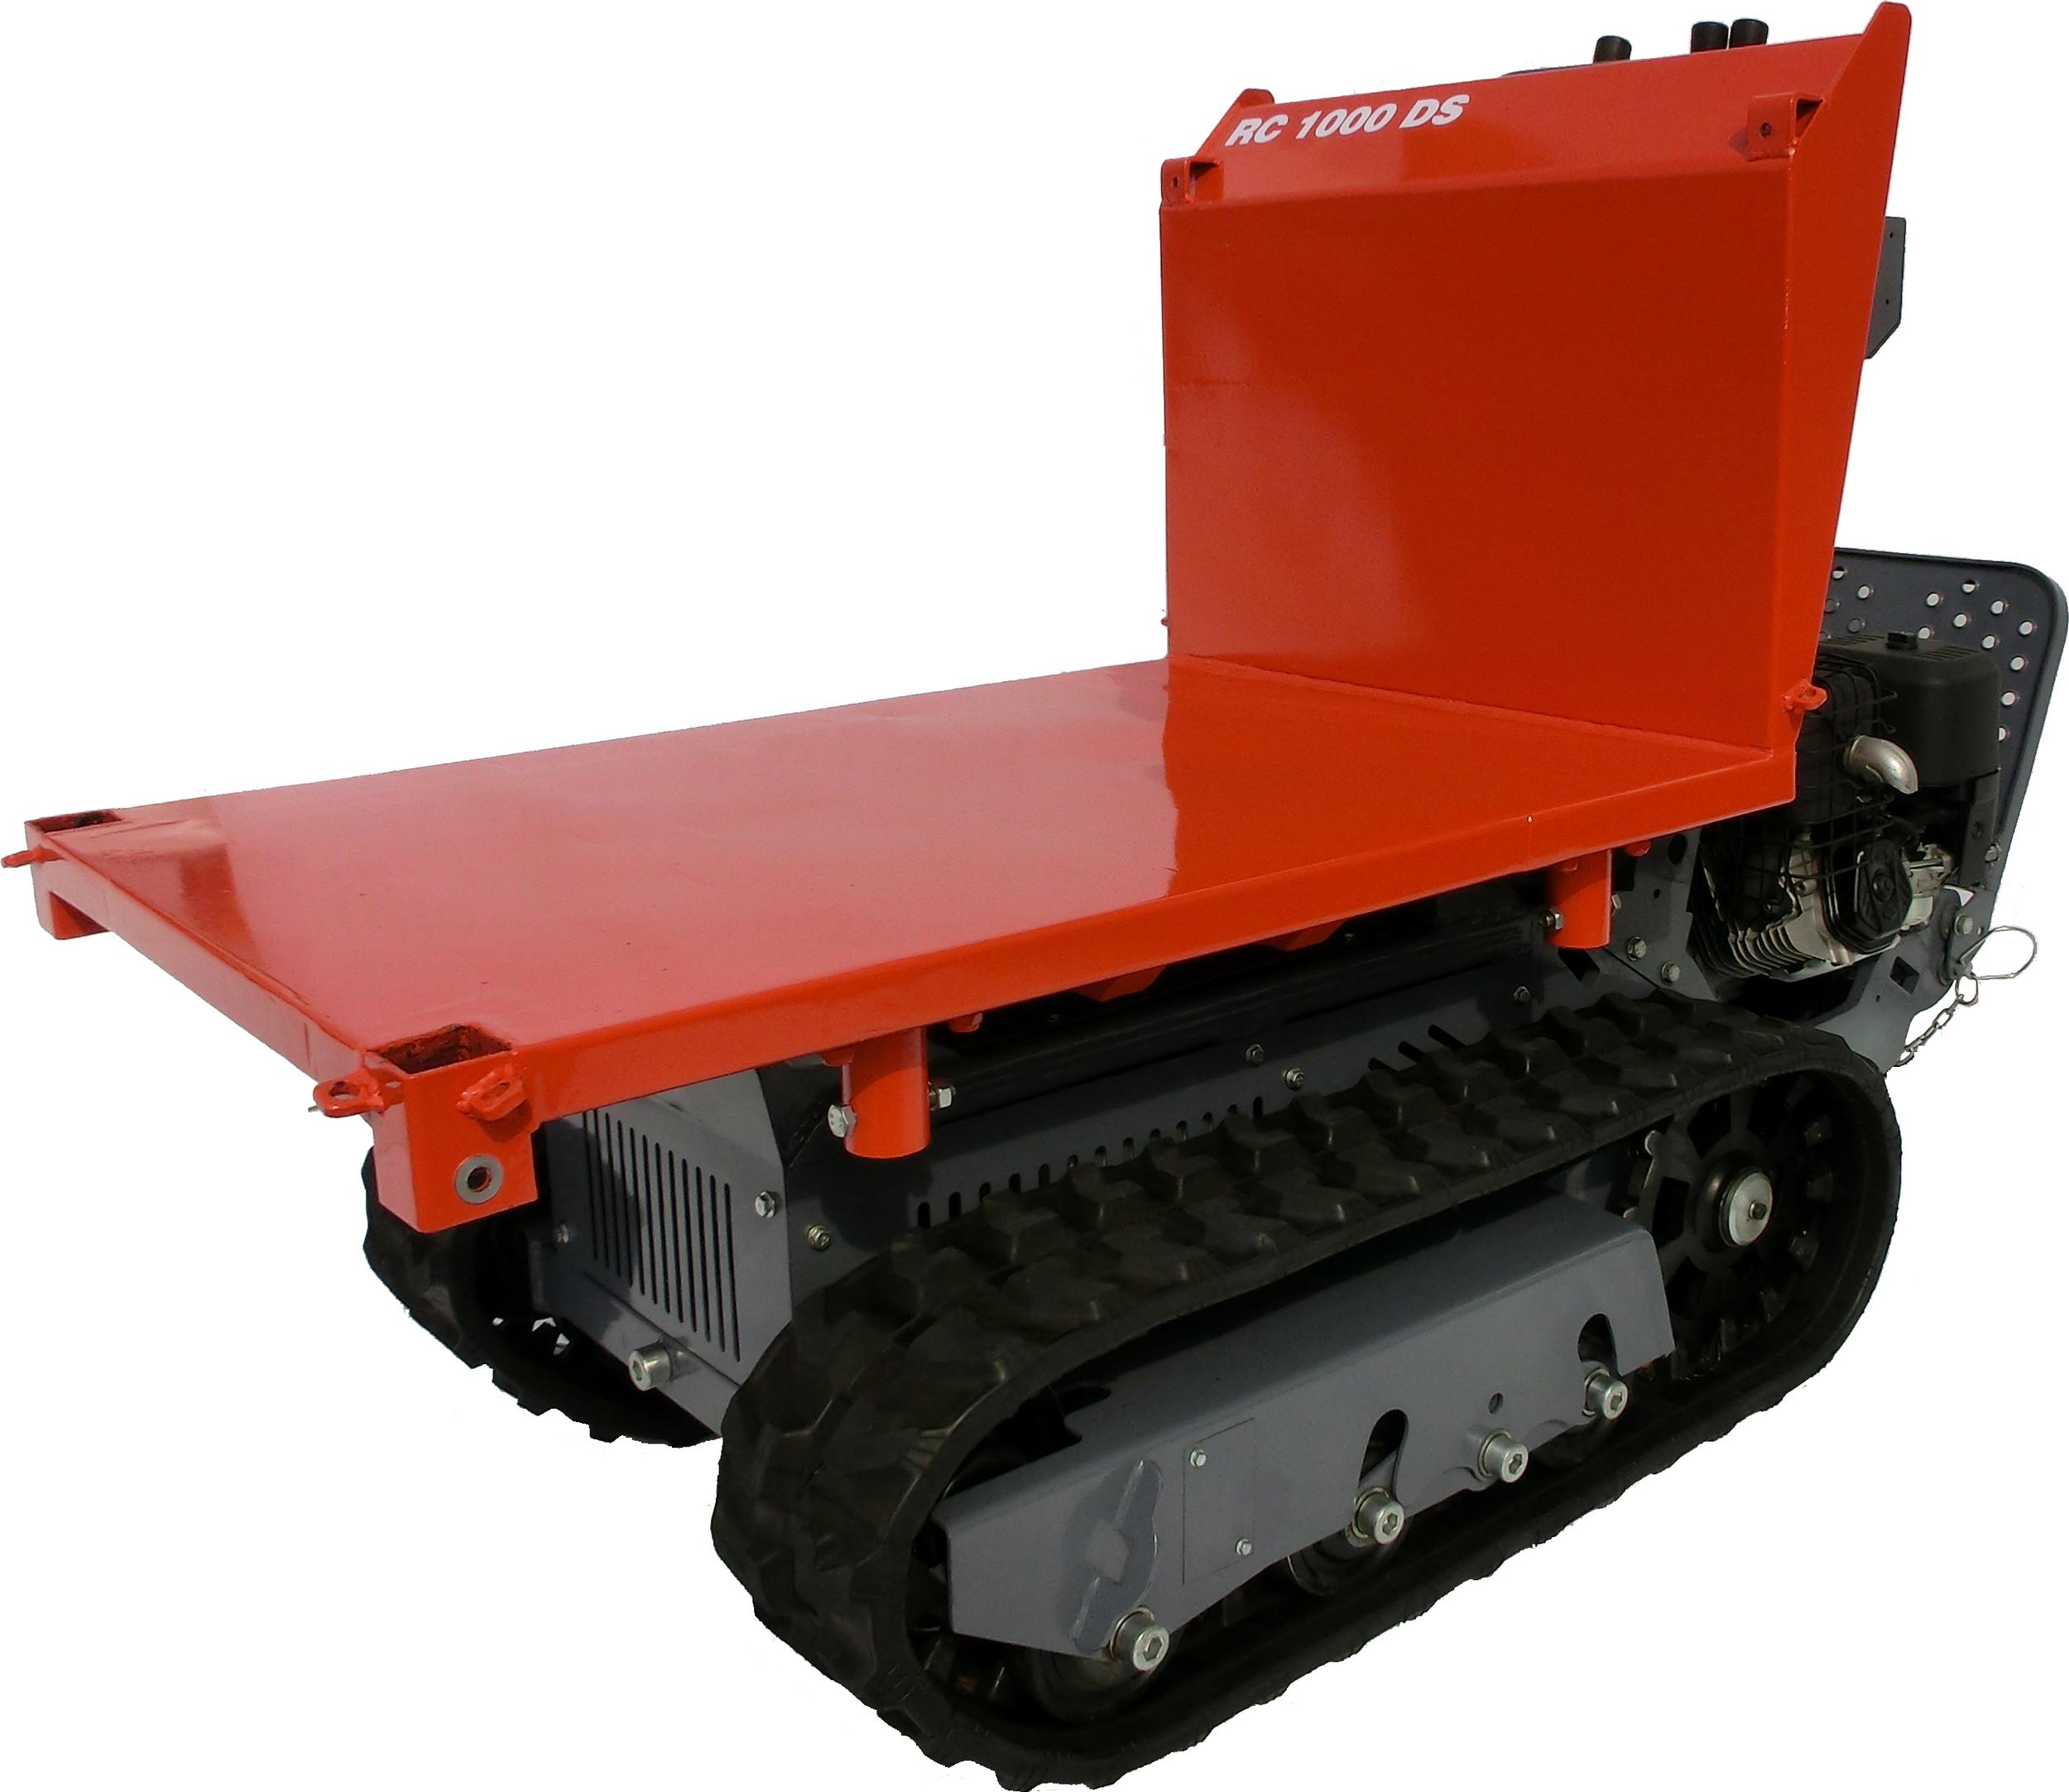 RC1000_track_haul_dump_PMI_Equipment